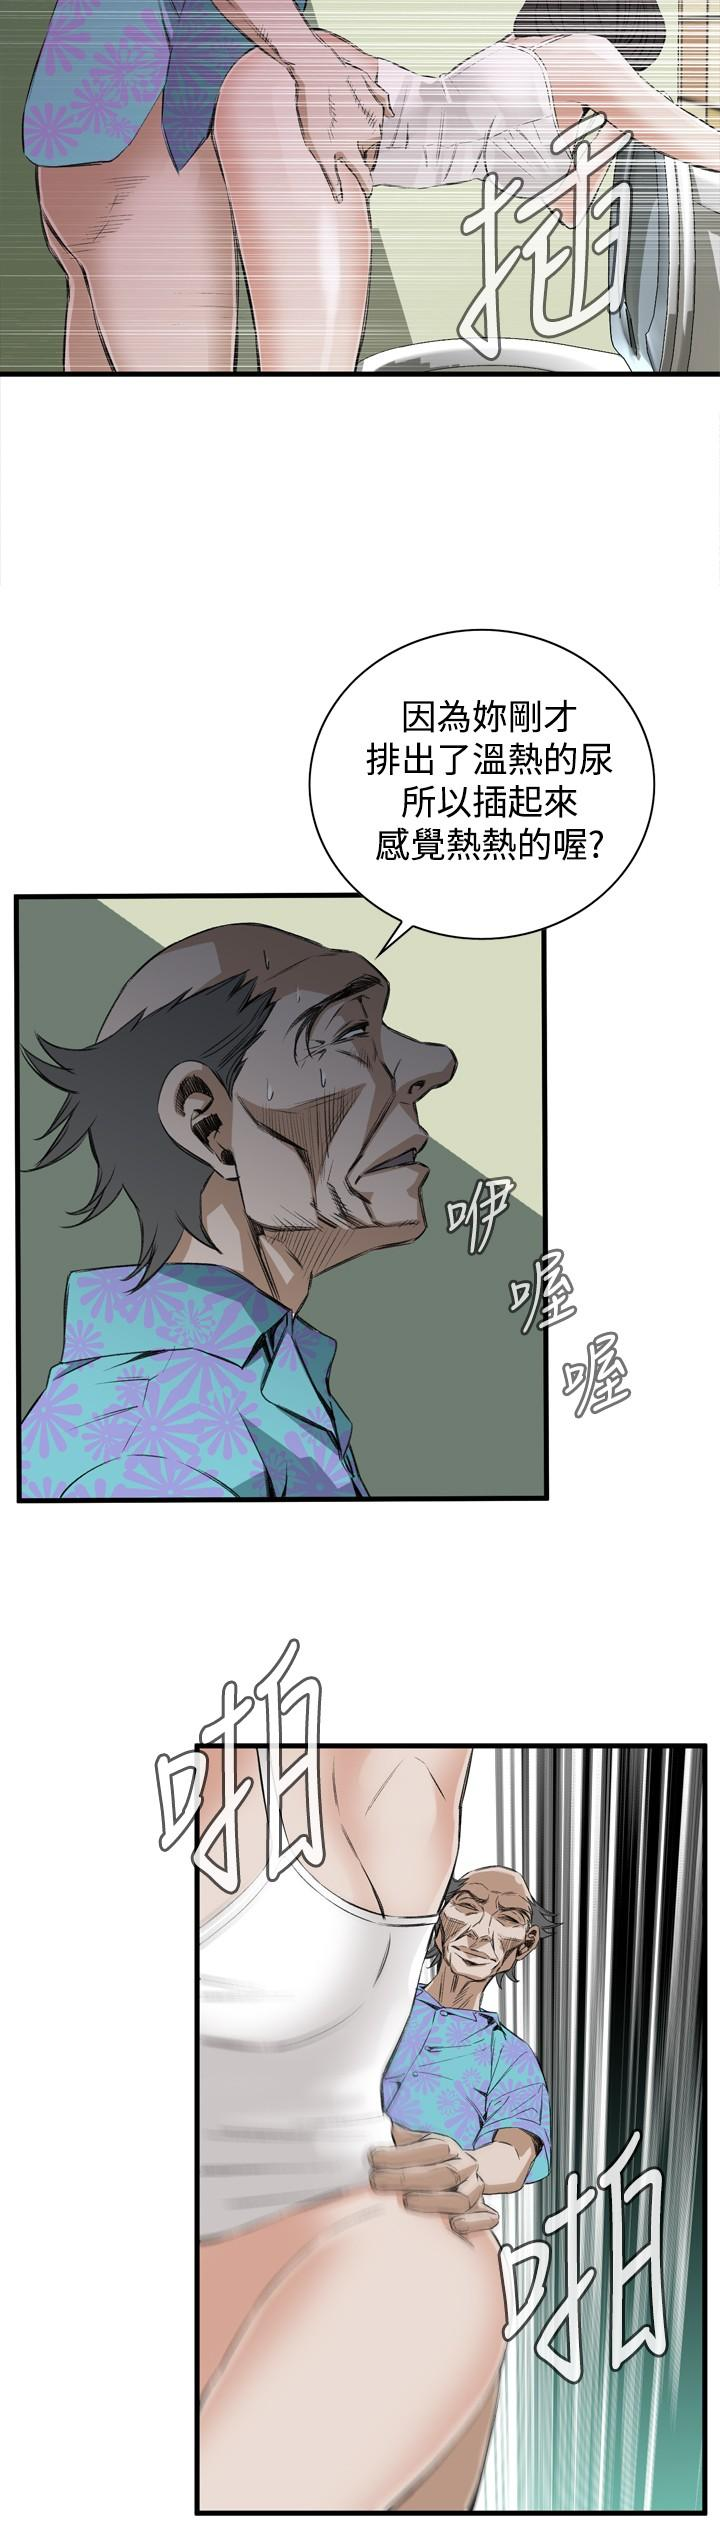 Take a Peek 偷窥 Ch.39~60 [Chinese]中文 275